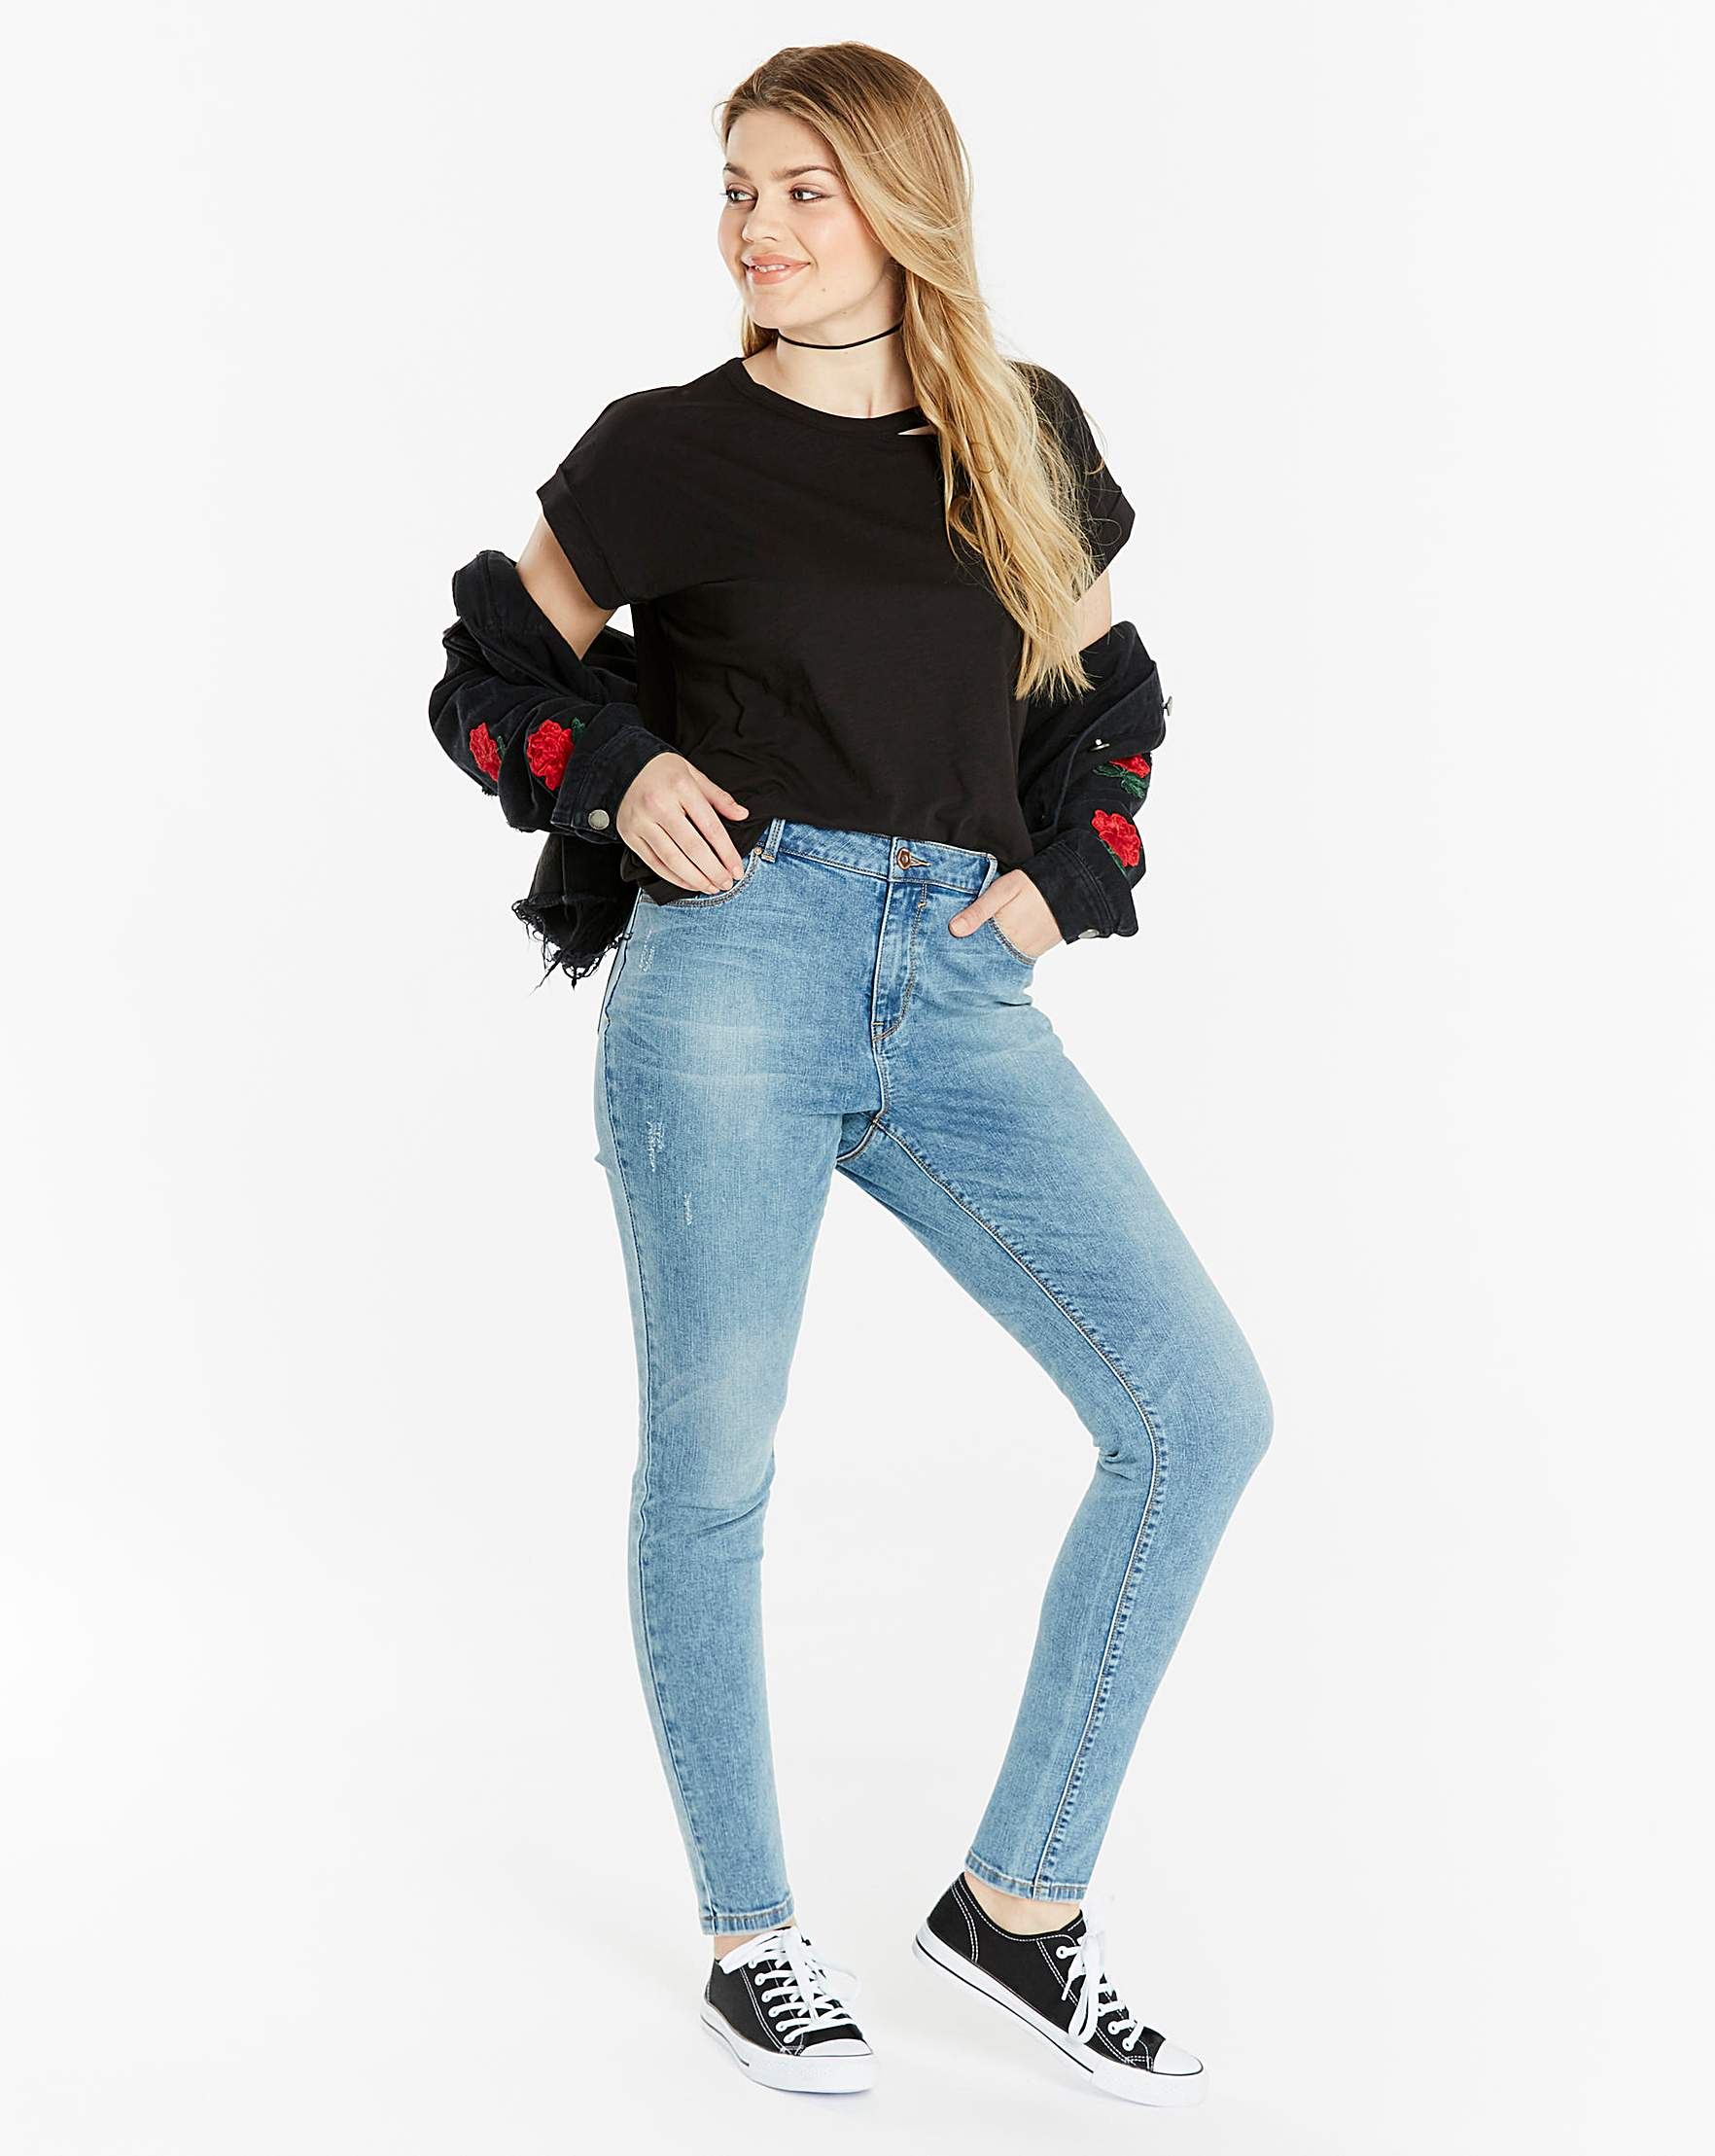 Chloe Skinny Jeans Short Simply Be Vintage Skin Rip Off Stretch Soft